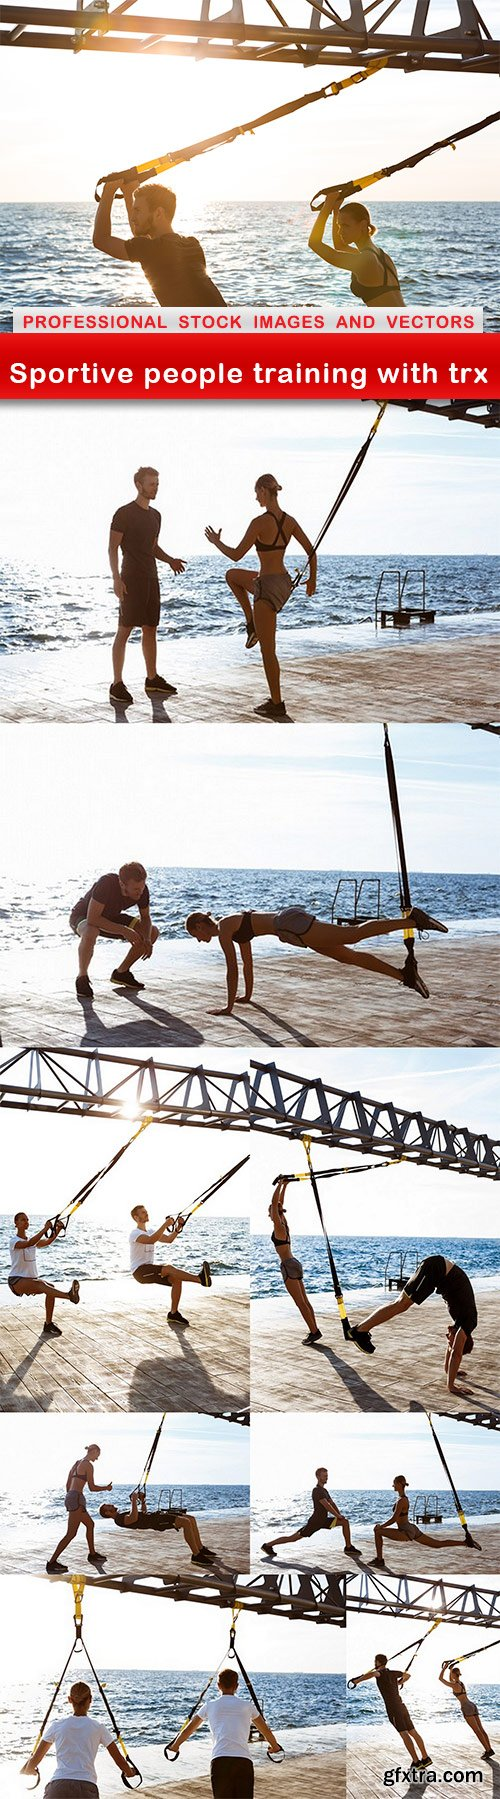 Sportive people training with trx - 9 UHQ JPEG